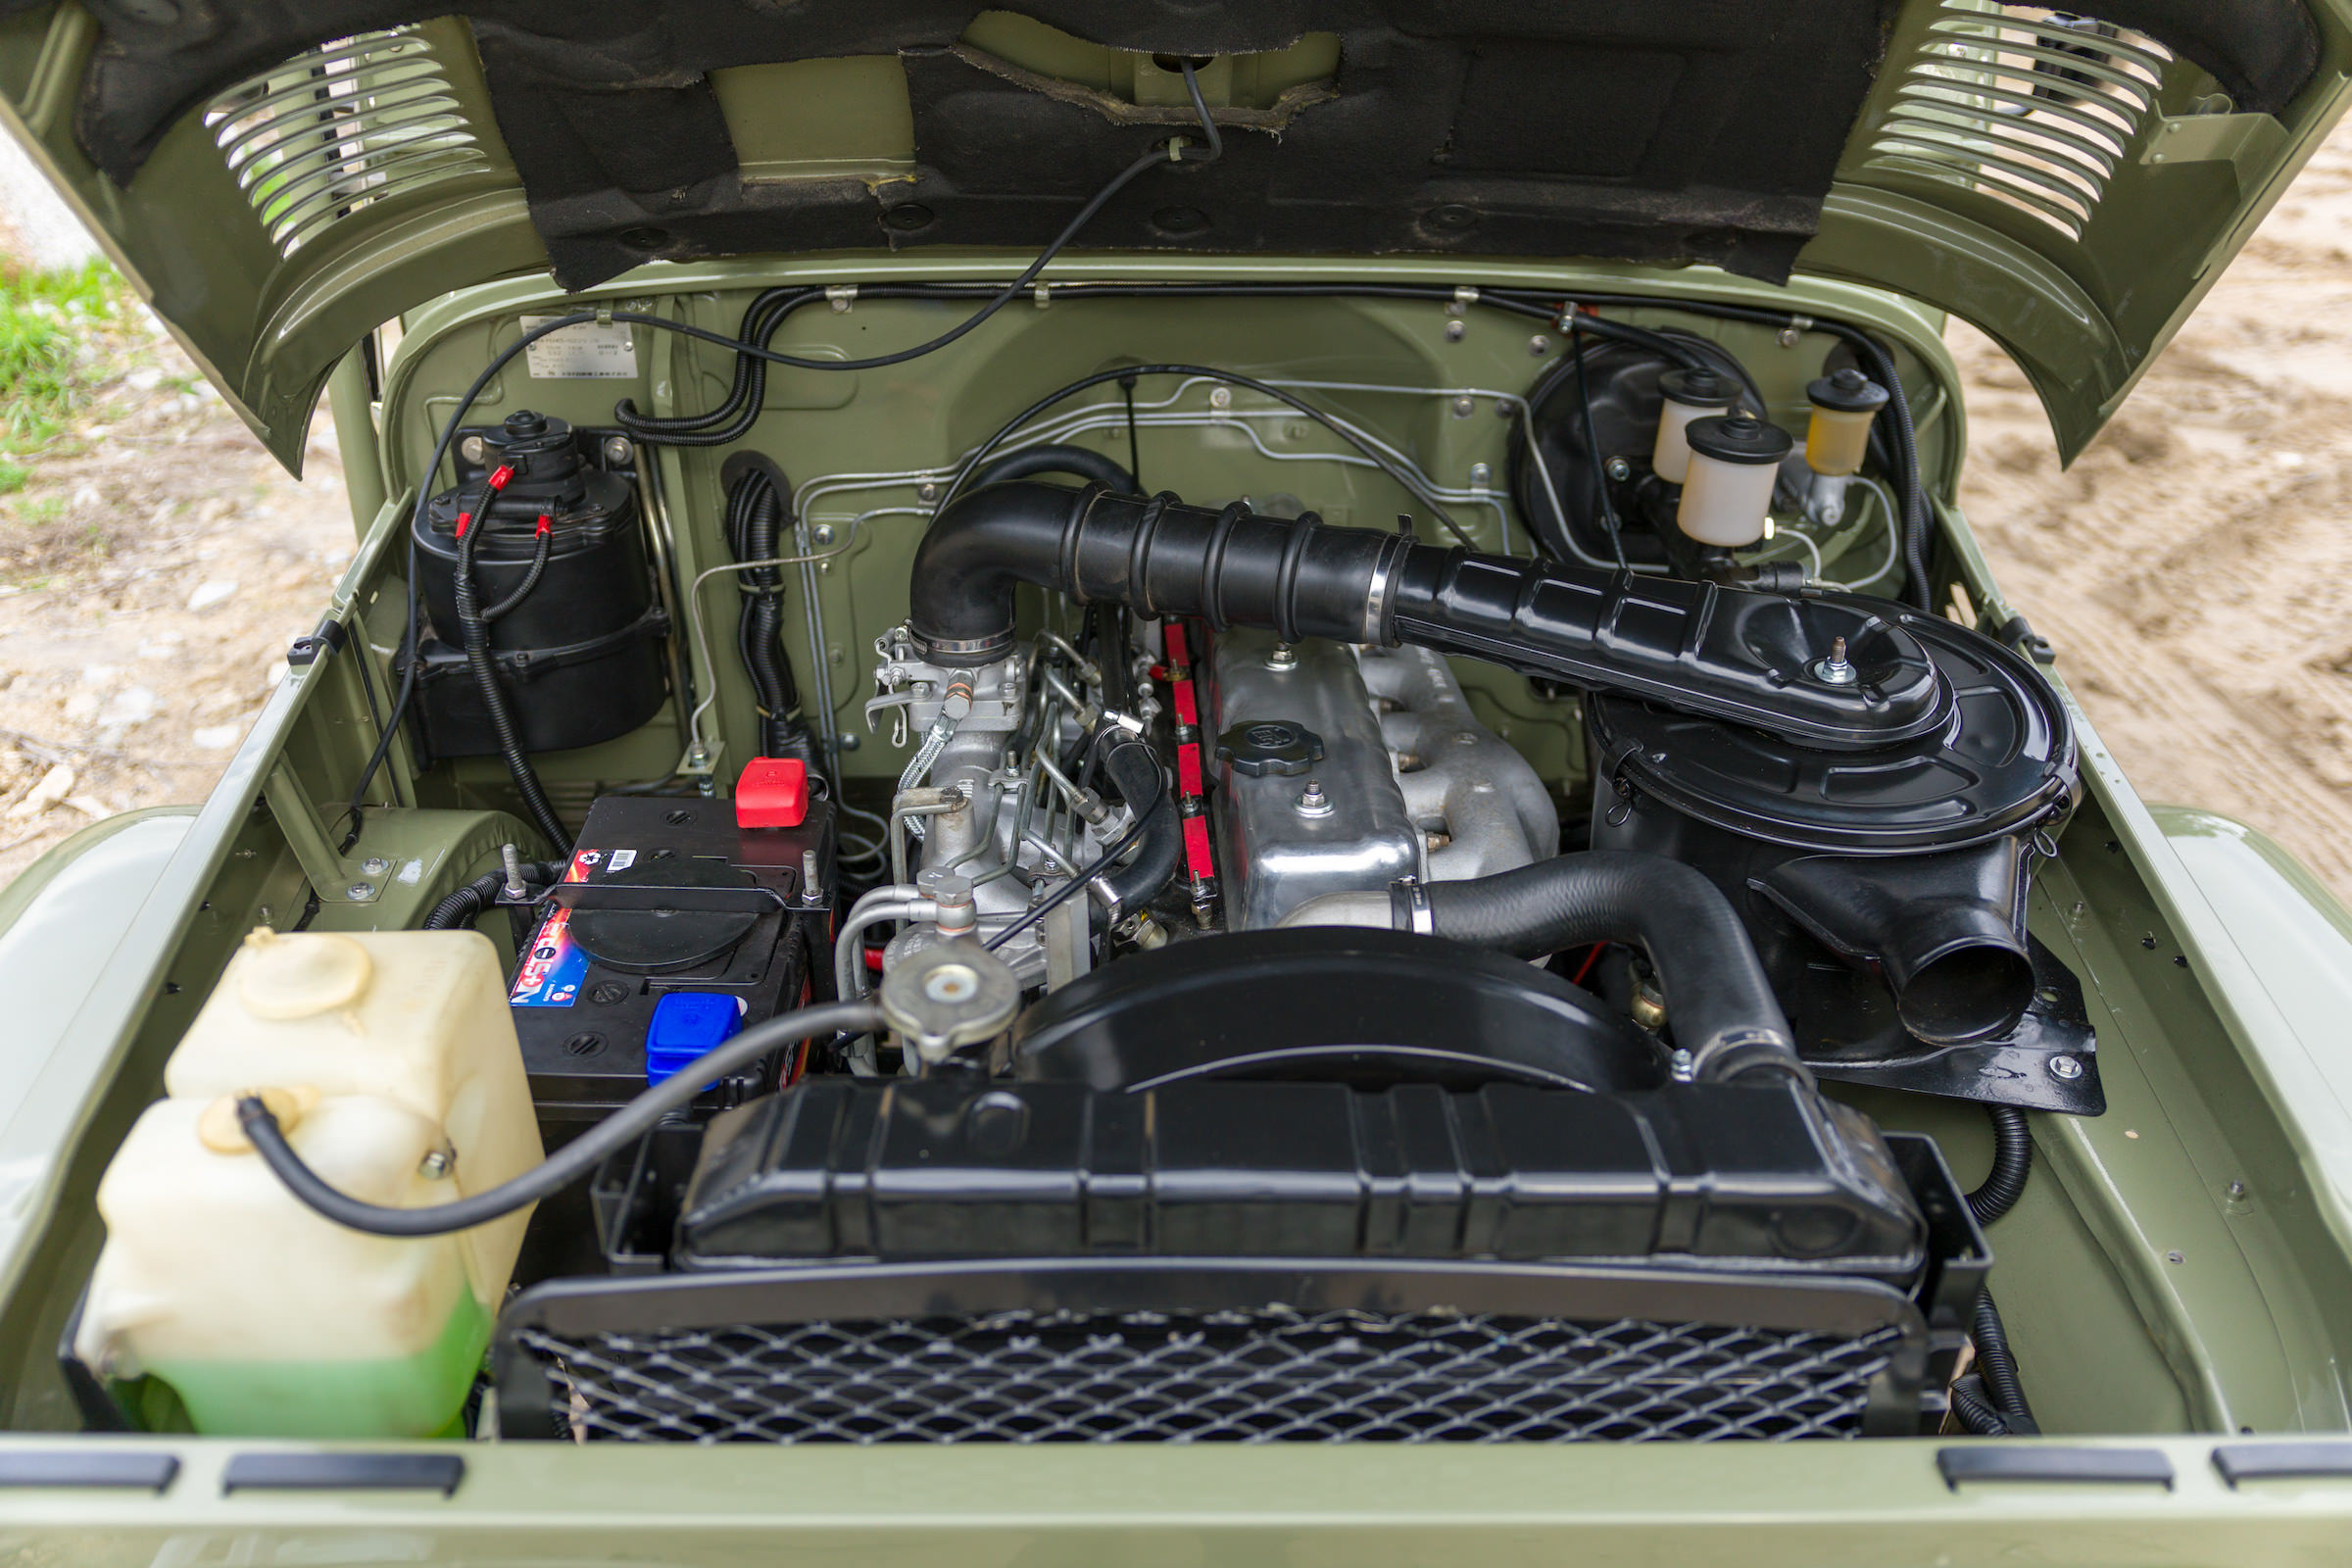 1978 Toyota Land Cruiser Hj45 Long Bed Pick Up Truck Engine